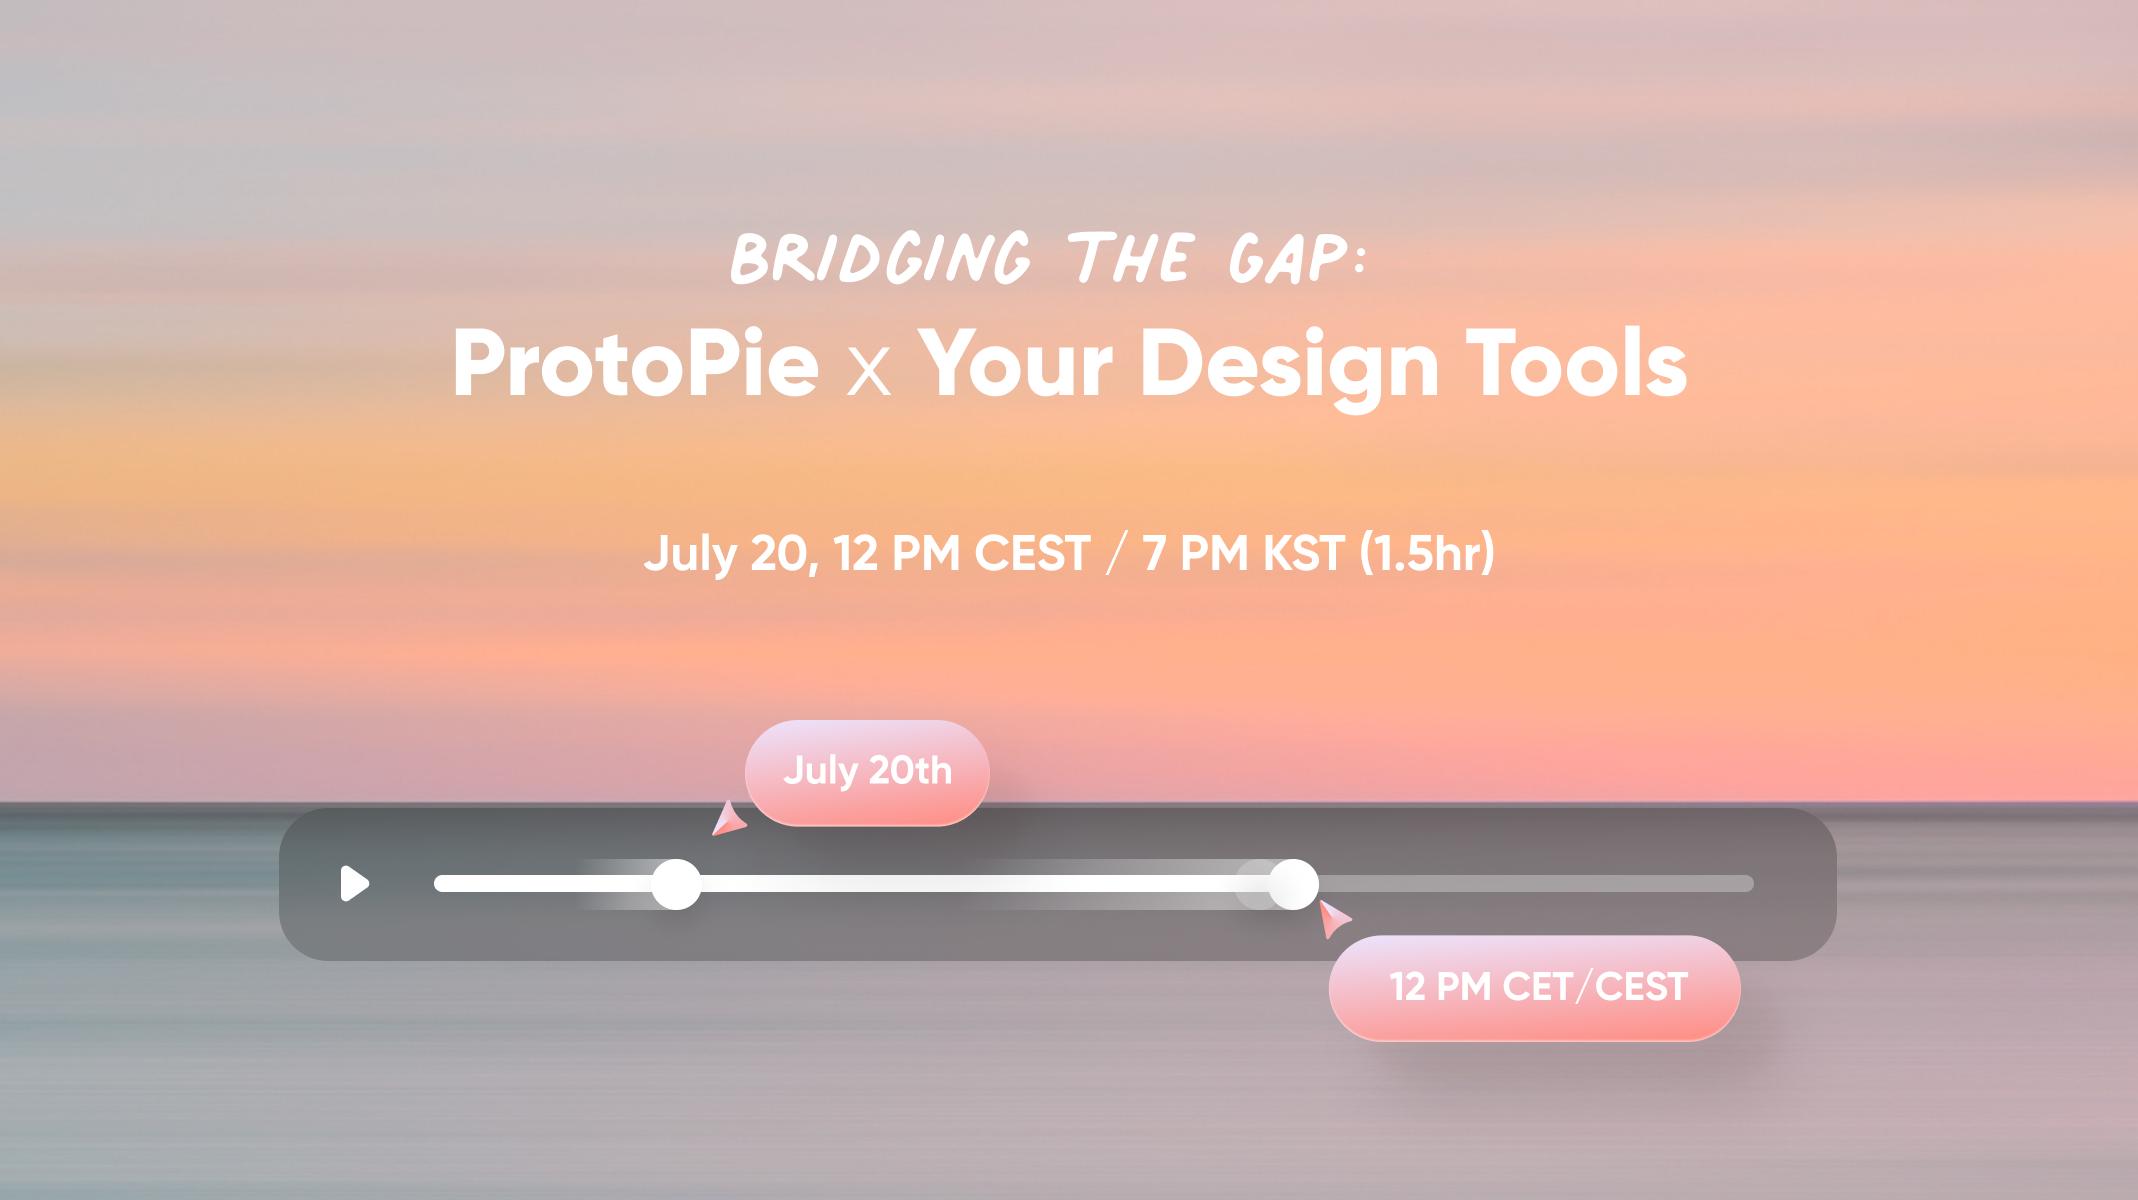 ProtoPie 5.5 Launch Event Bridging the Gap ProtoPie x Your Design Tools thumbnail